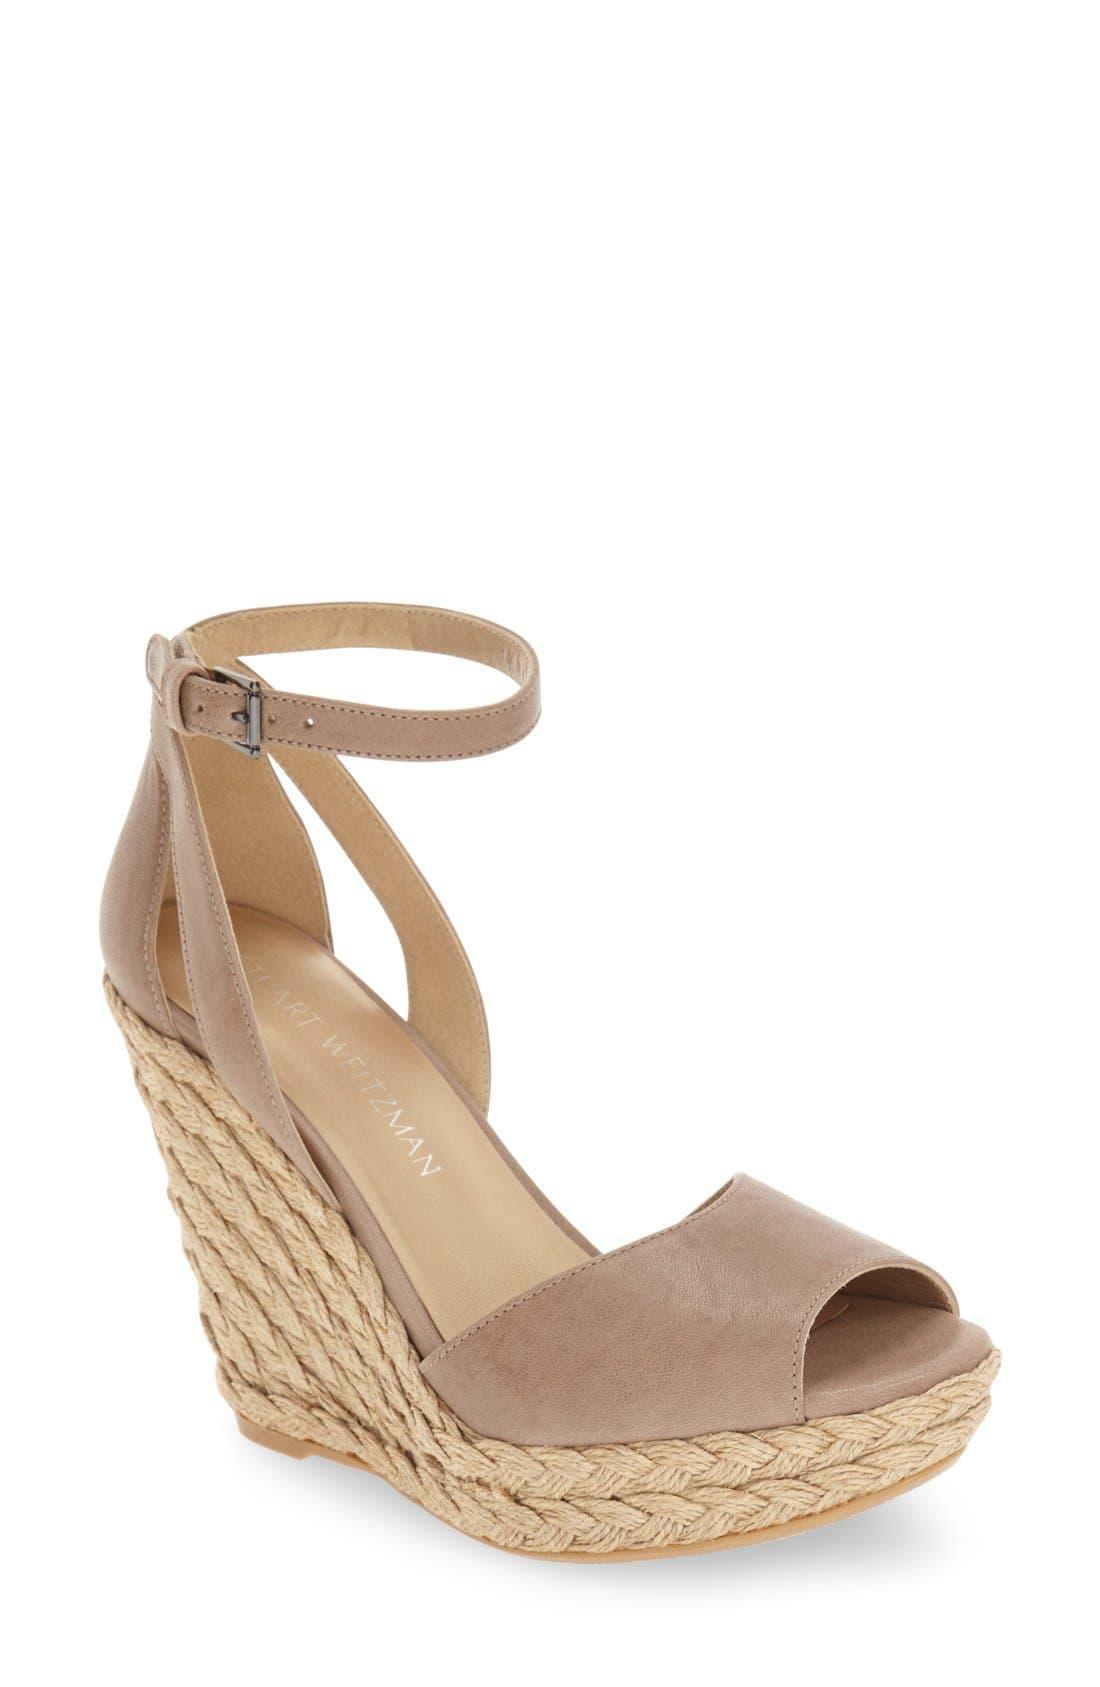 Main Image - Stuart Weitzman 'Hijinx' Espadrille Platform Wedge Sandal (Women)